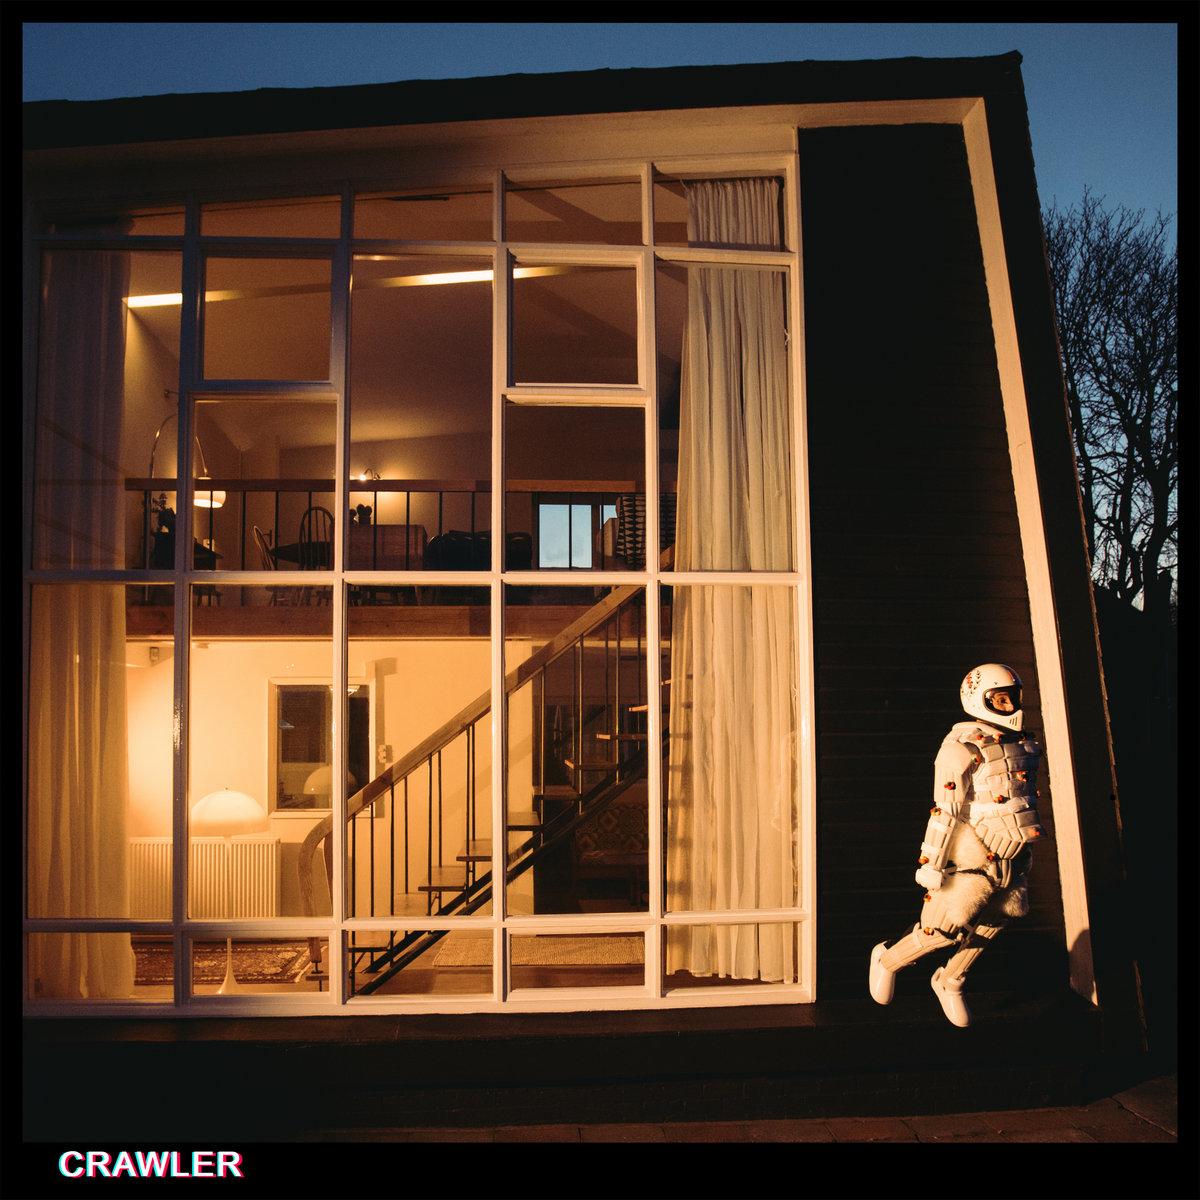 Portada del disco 'Crawler' de Idles (2021)